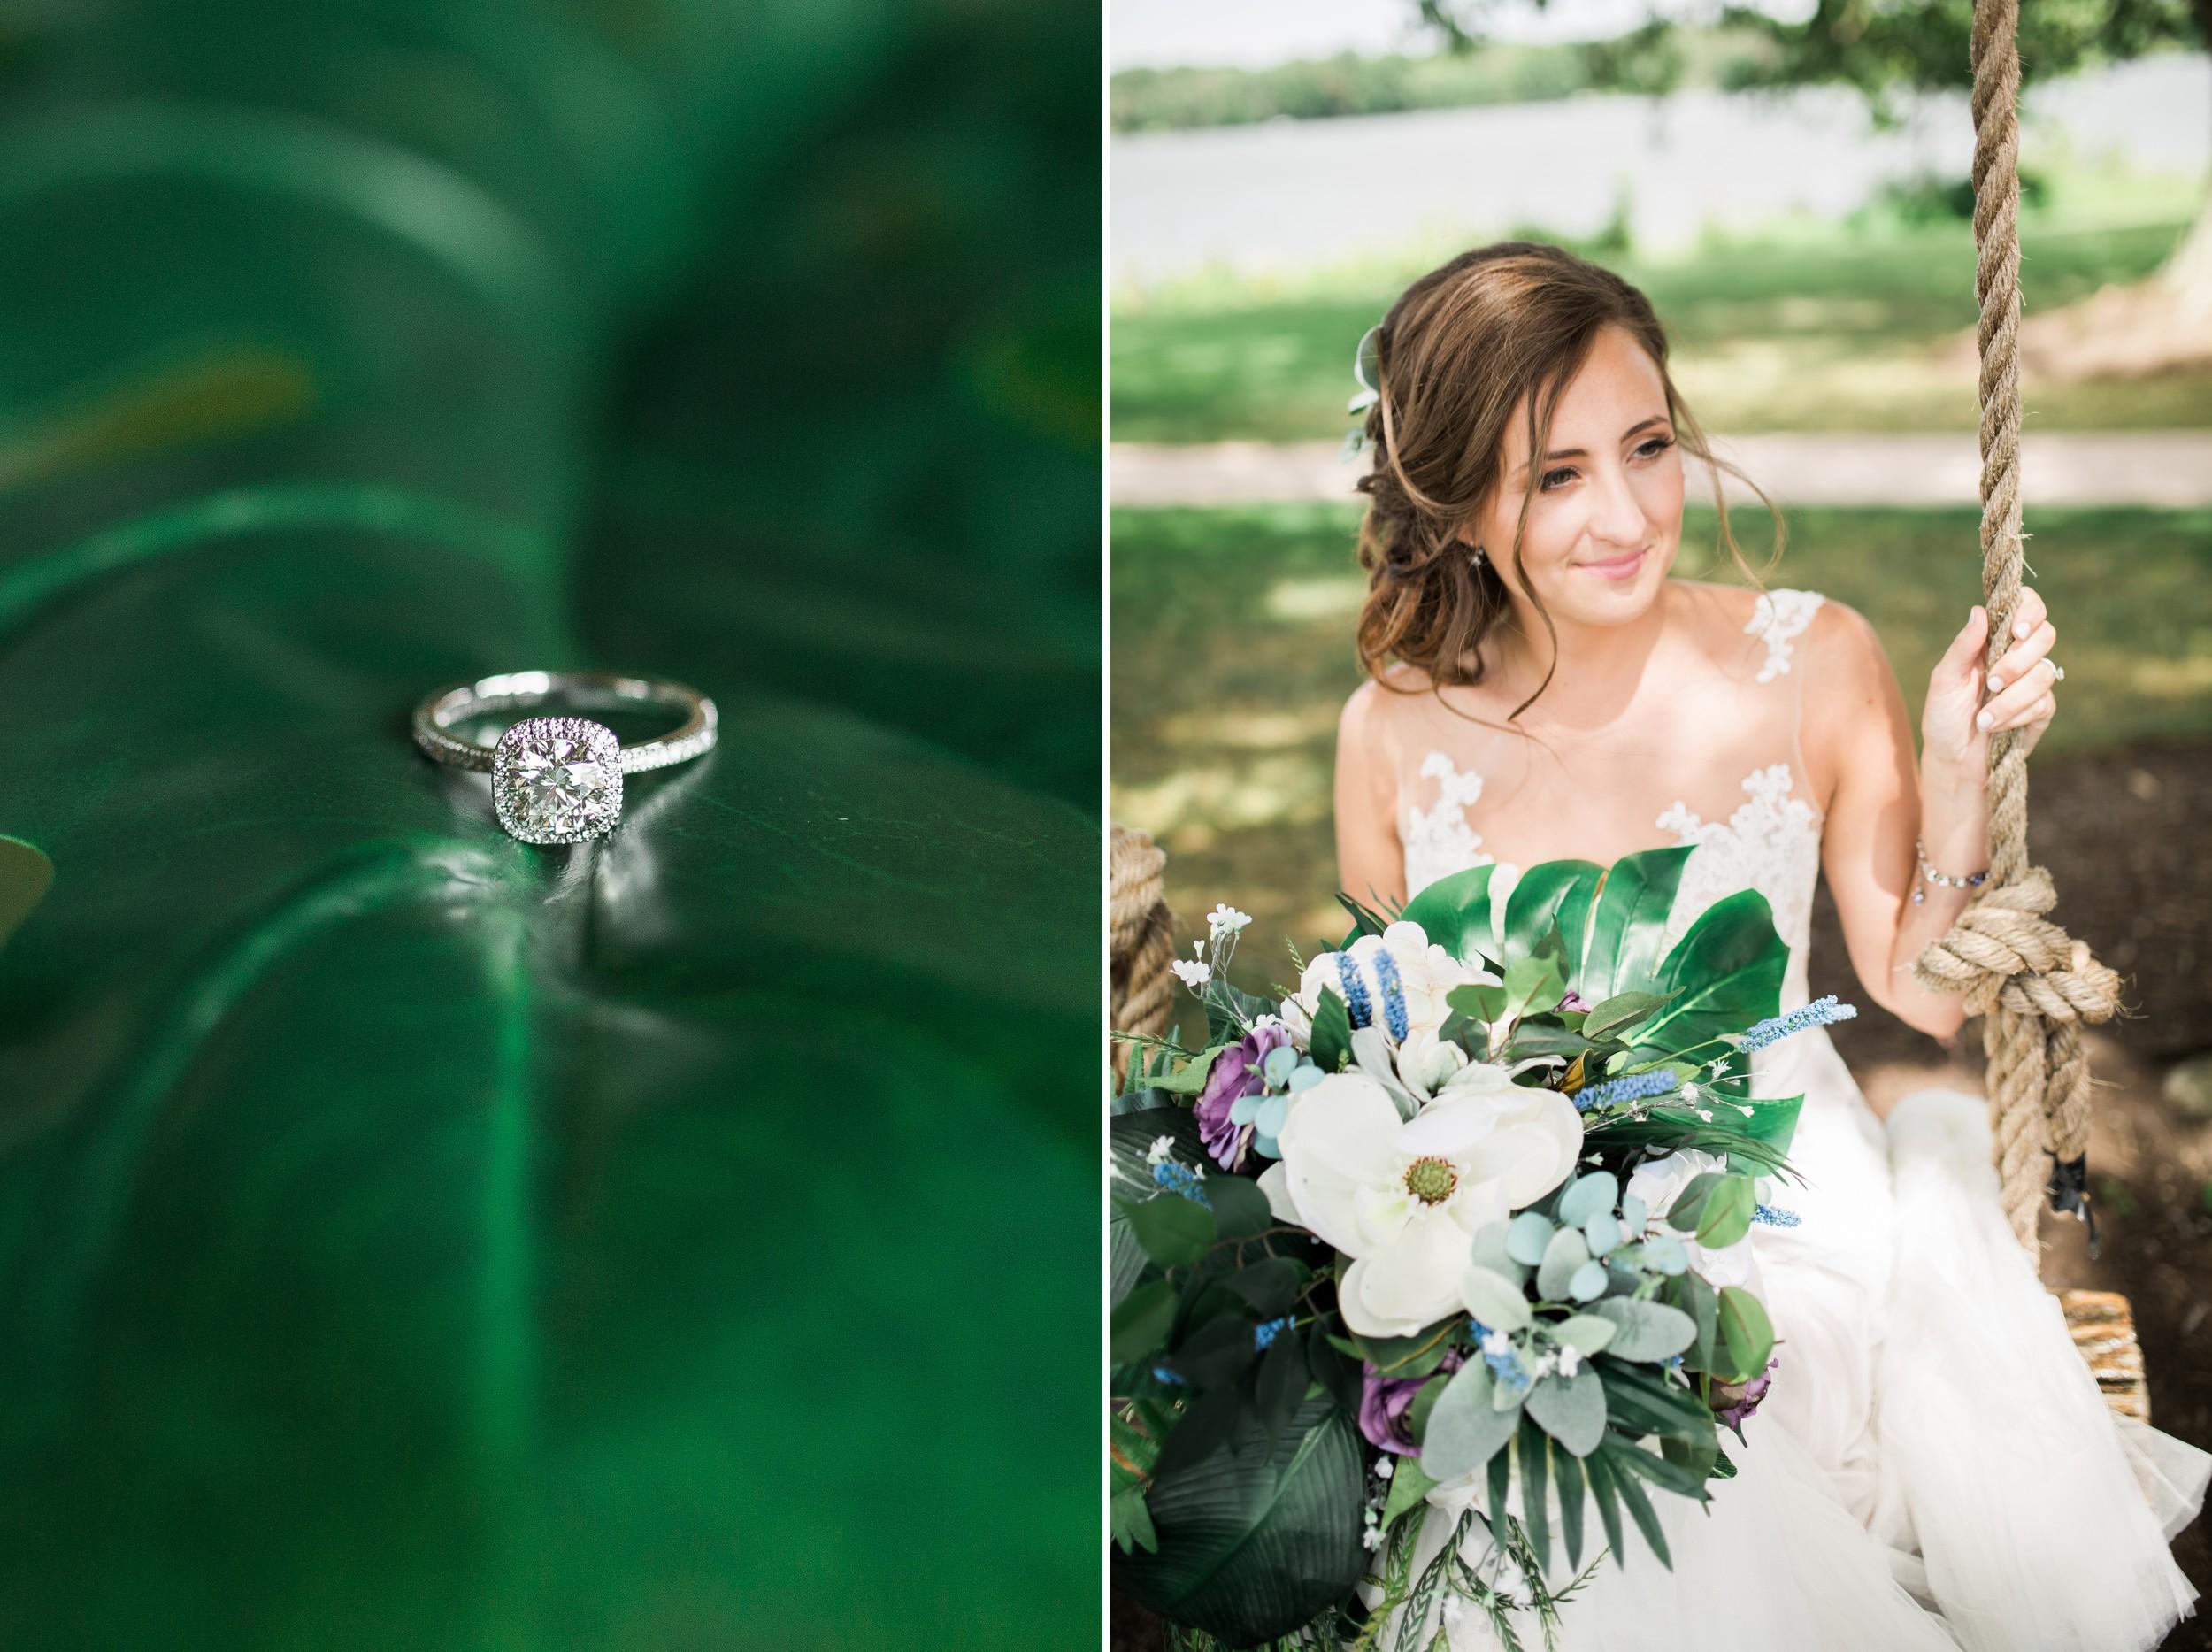 Nick-and-martina-pinelake-vinyards-wedding-columbiana-ohio-tracylynn-photography 4.jpg